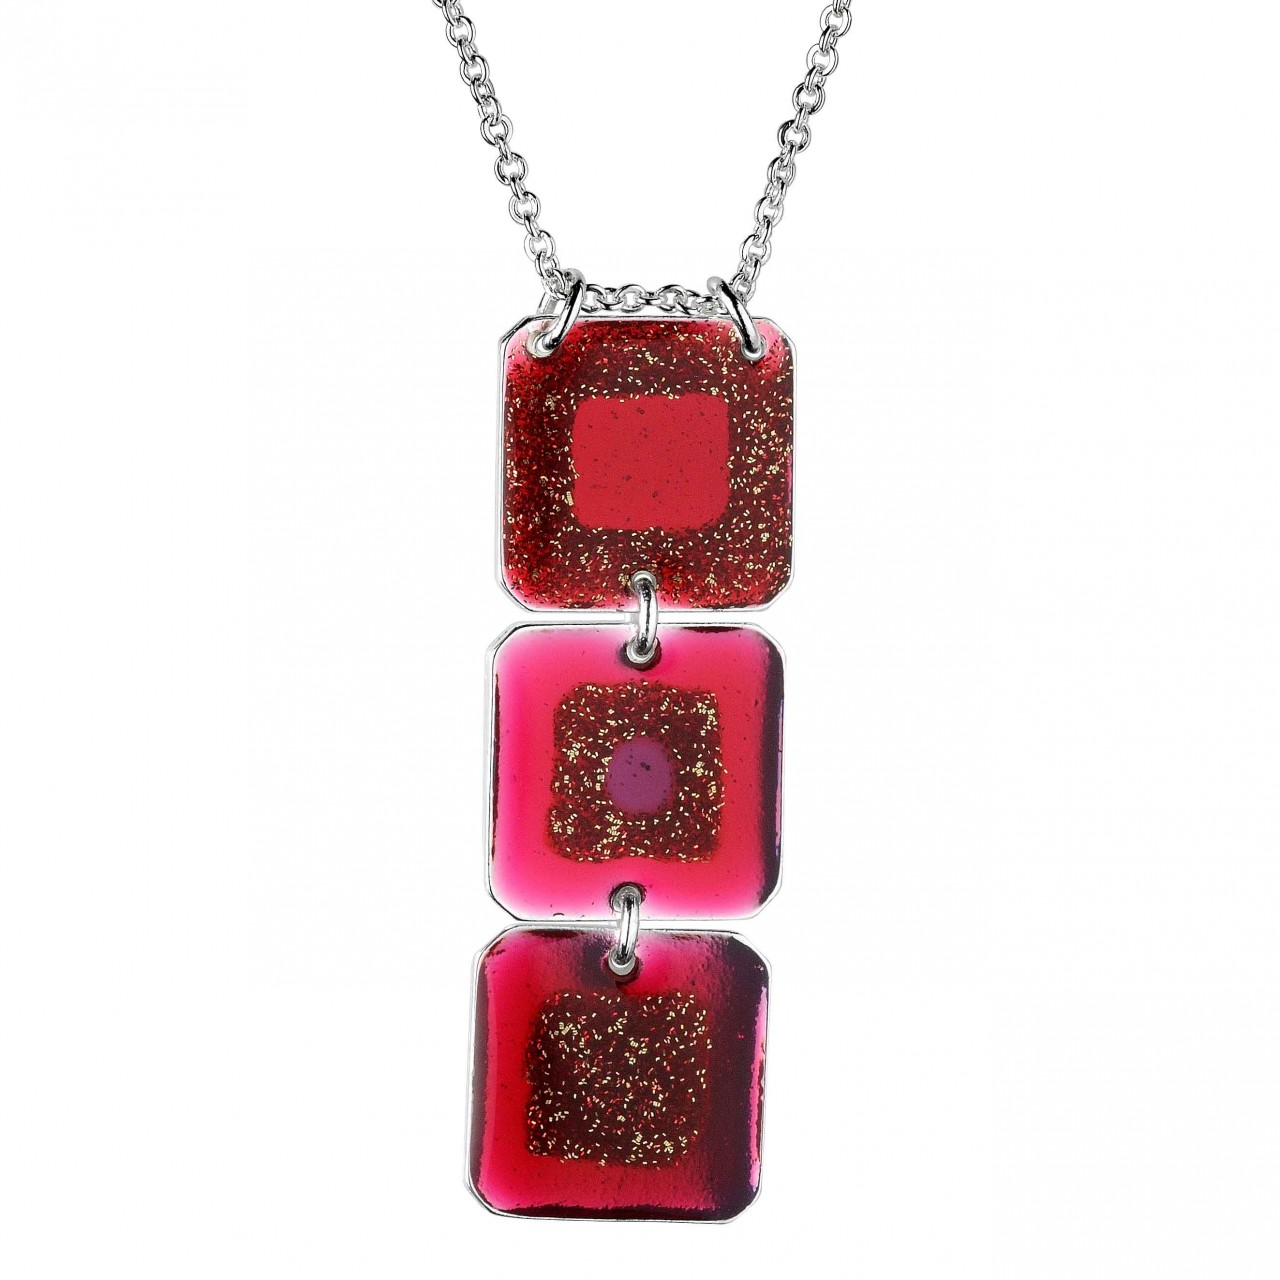 SKALLI PARIS - ORIGIN 08 Necklace colour GRIOTTE